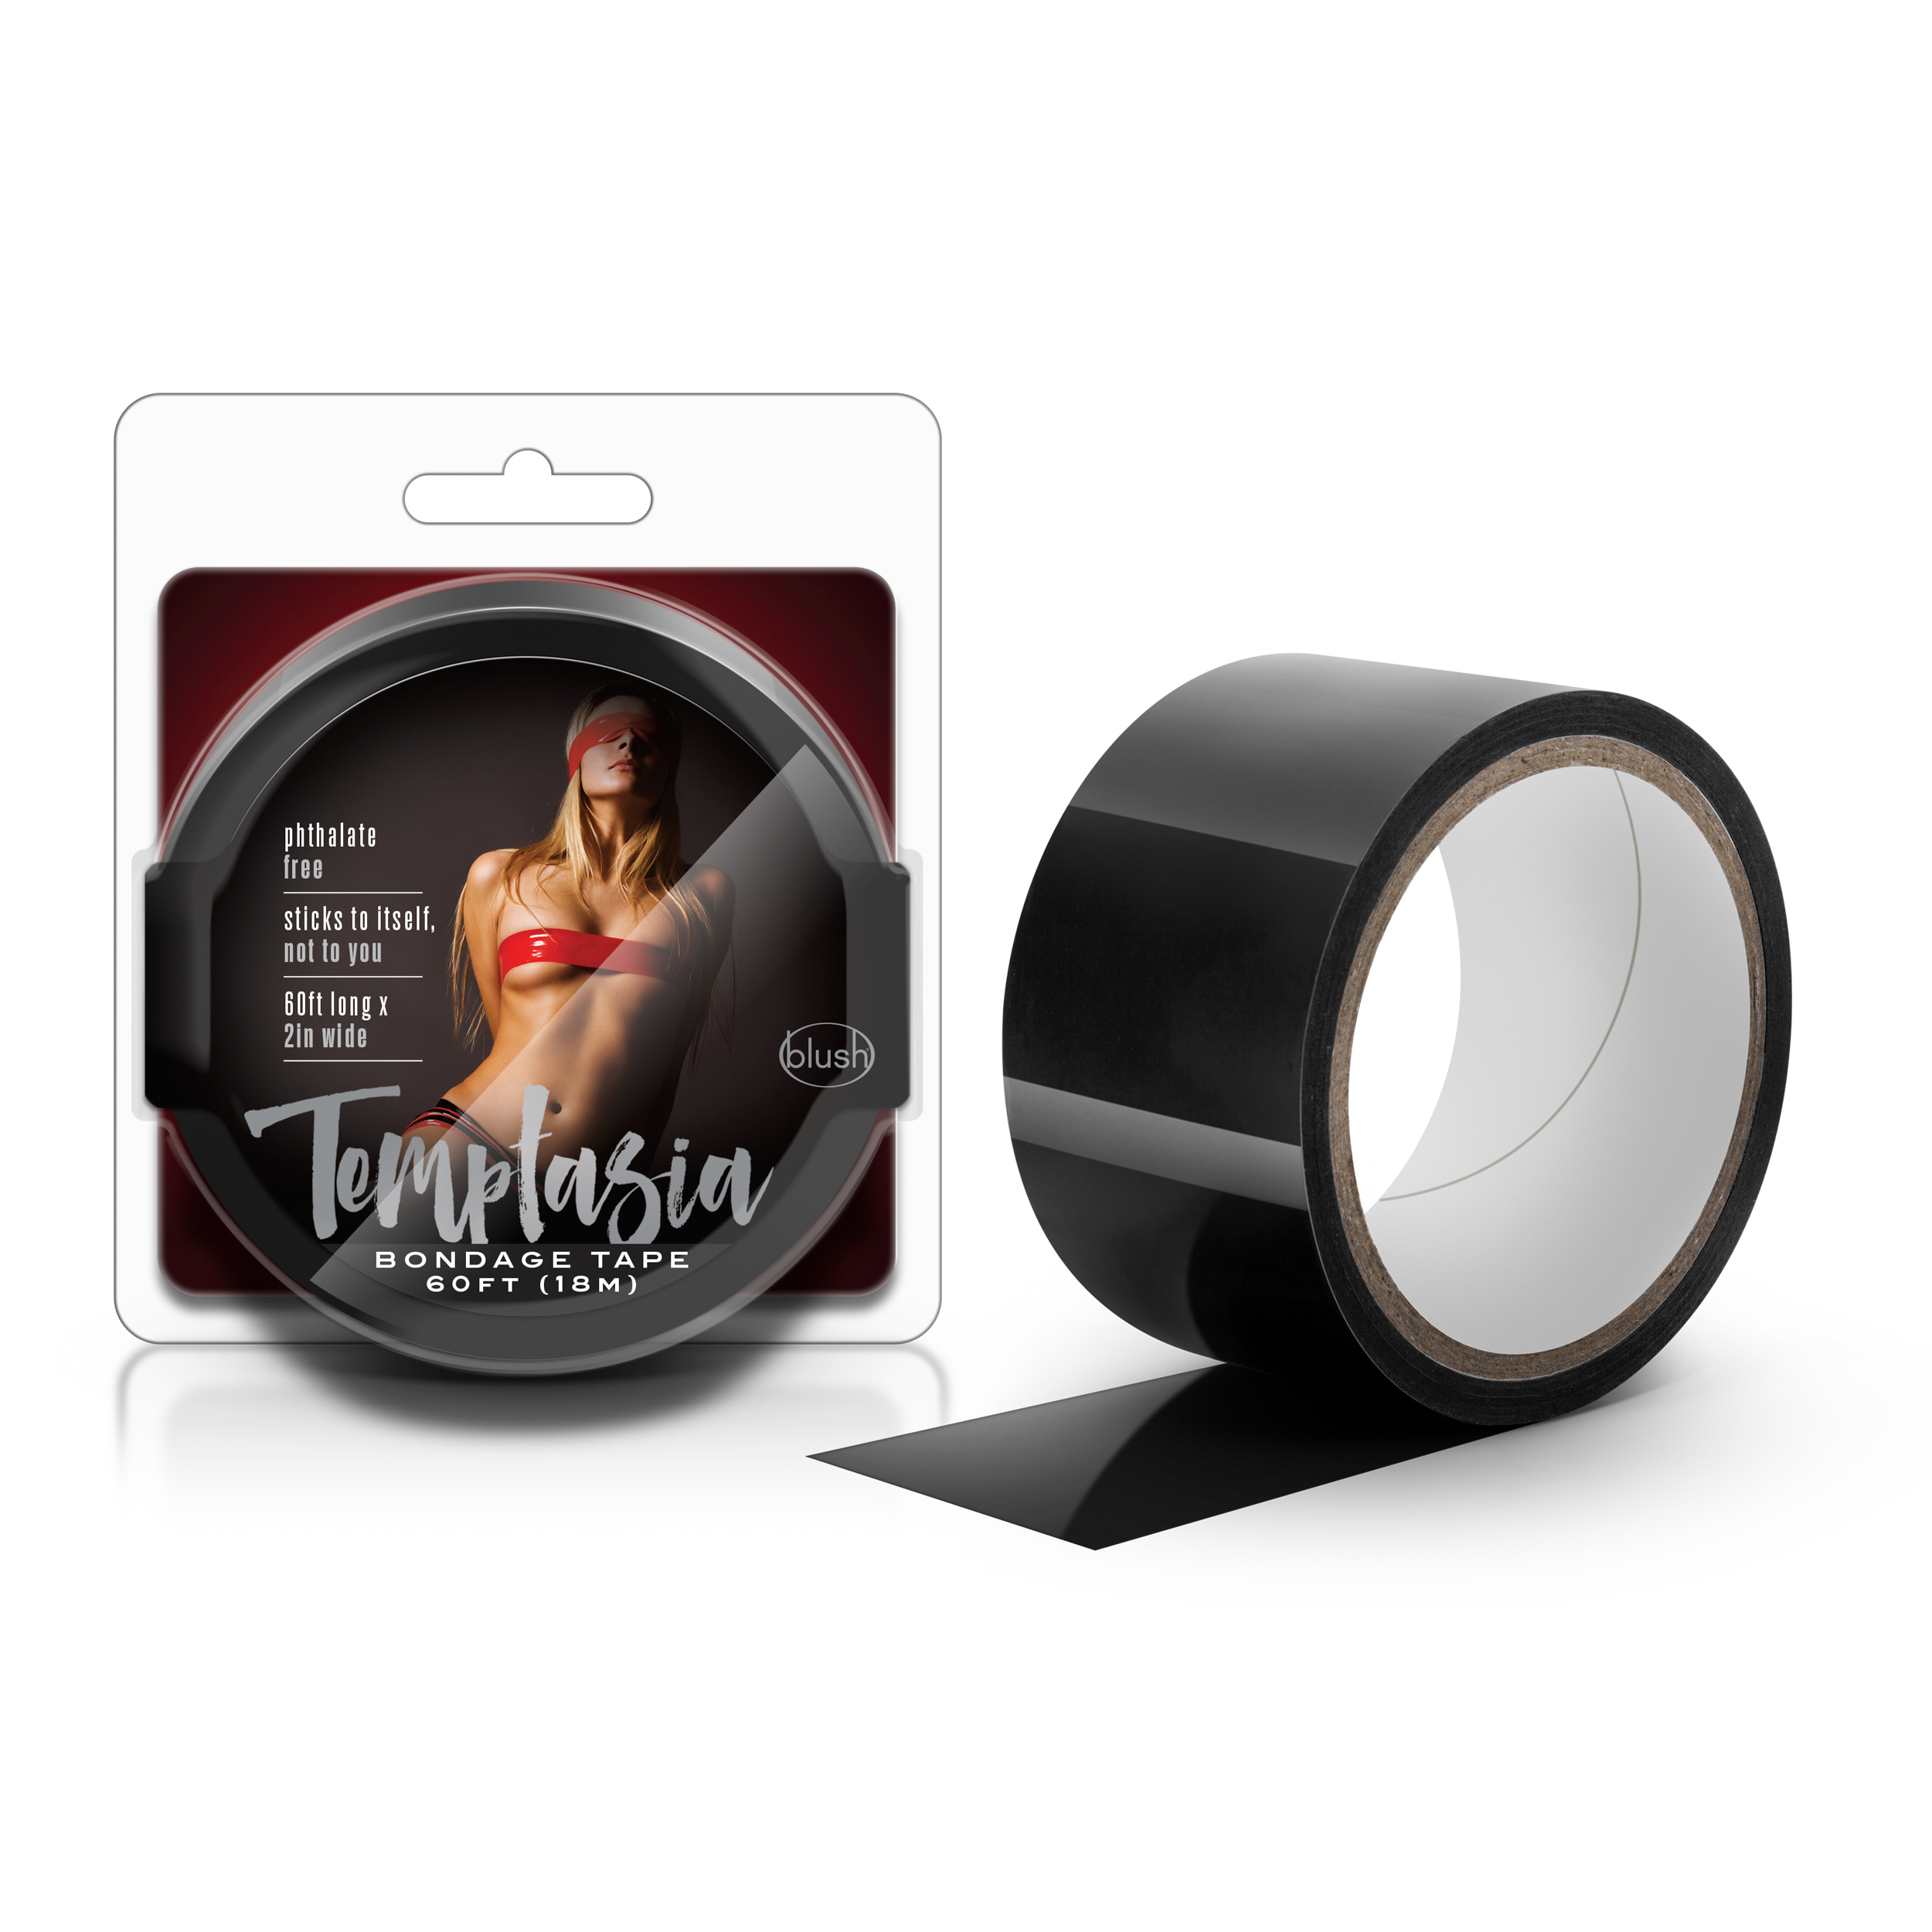 Temptasia - Bondage Tape - 60 Feet - Black